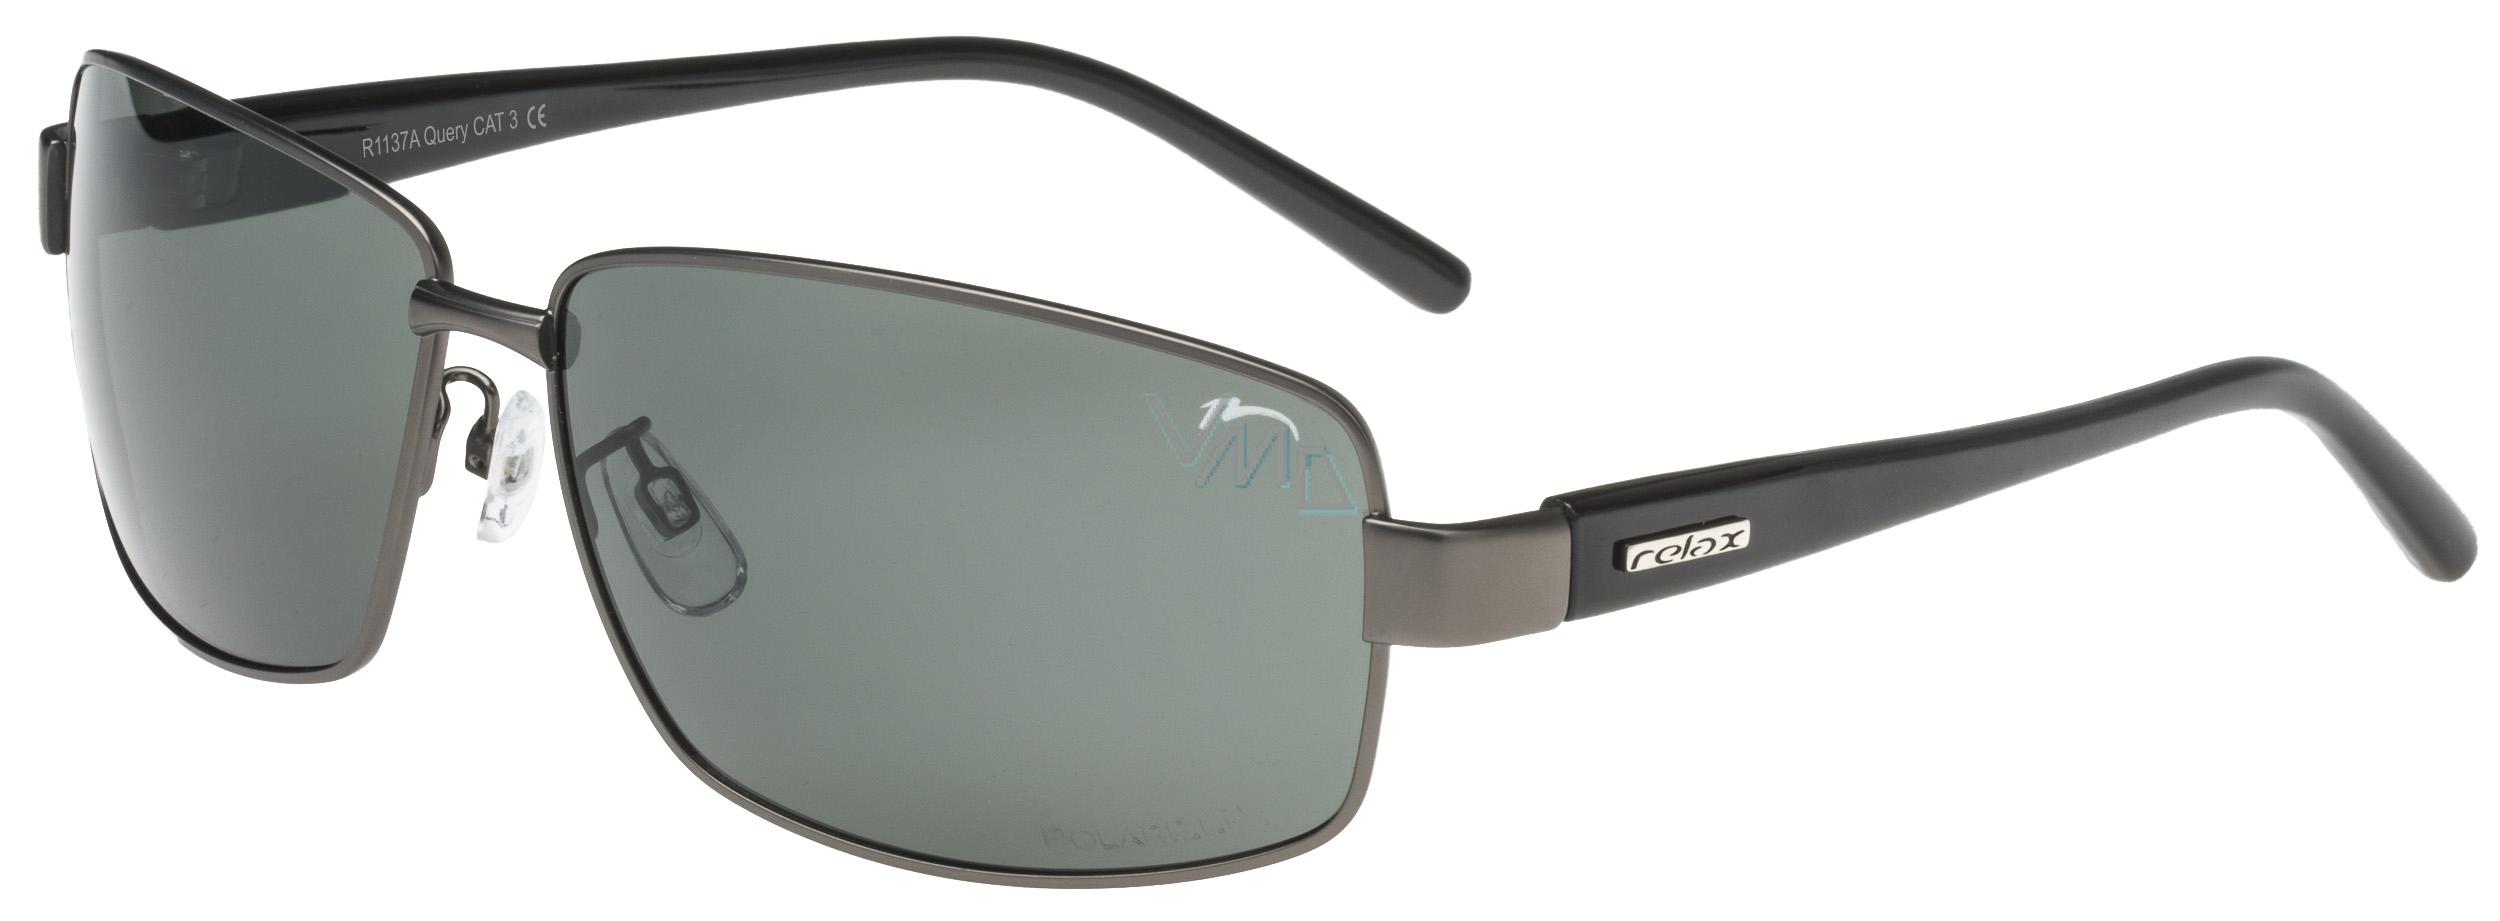 e9dcf8111 Relax Query Sluneční brýle R1137A - VMD drogerie